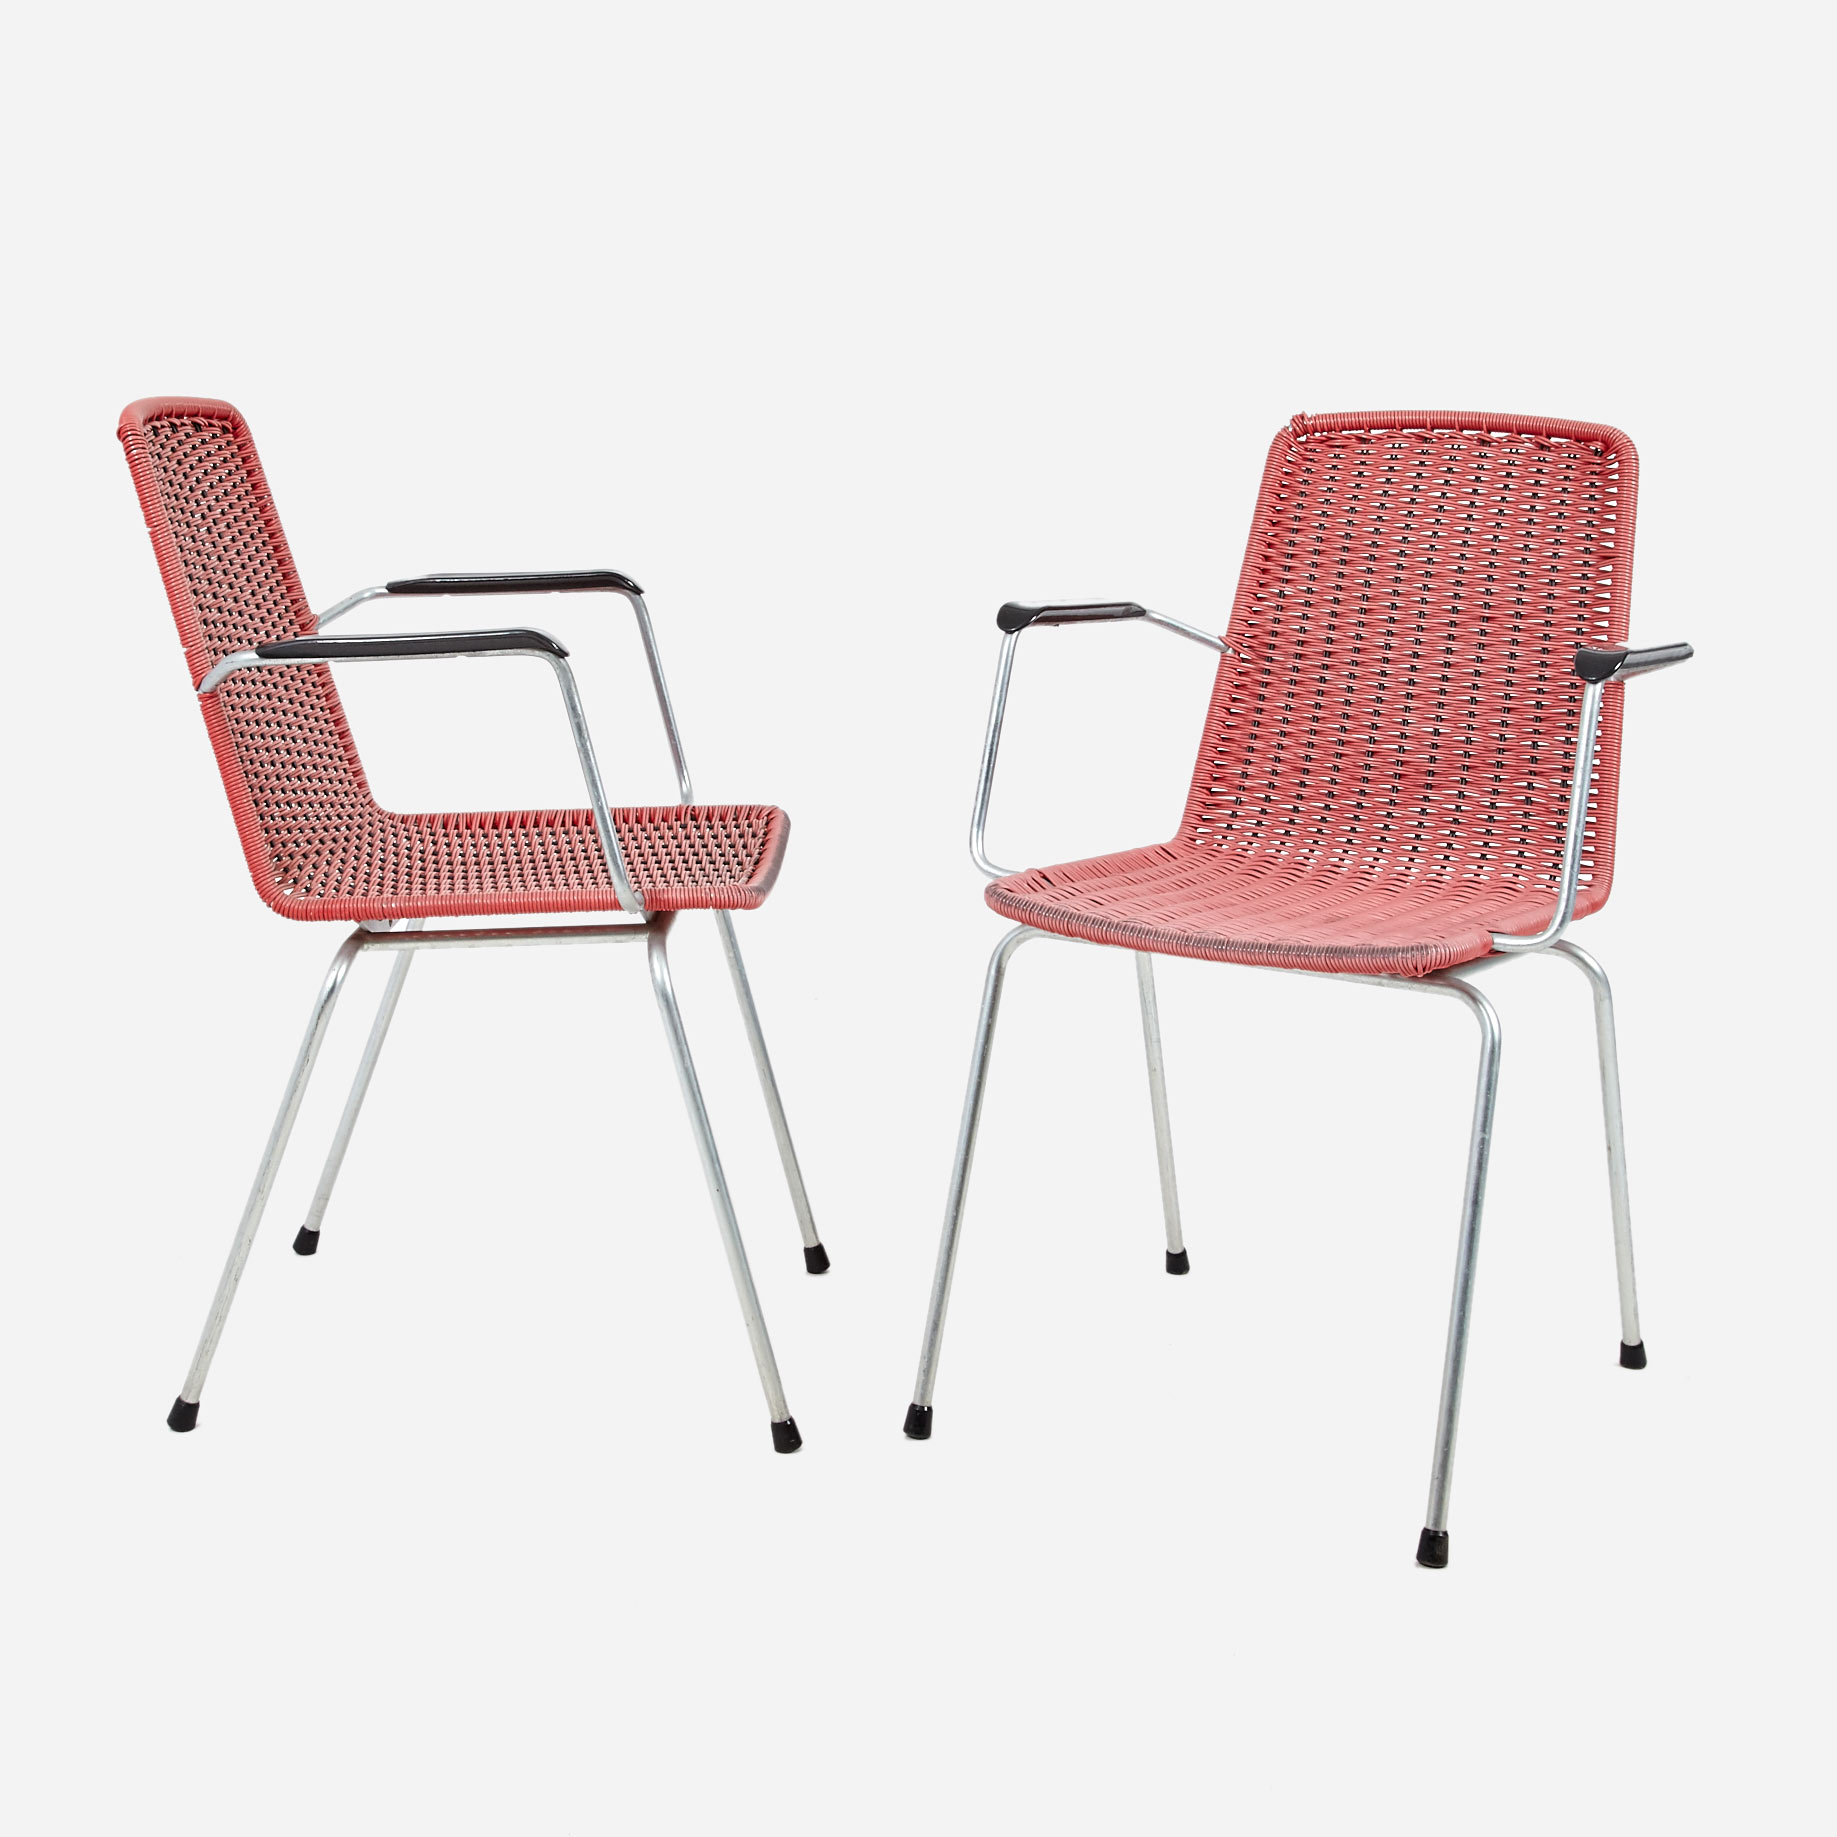 gartenstuhl mit armlehne stapelbar 2 stk m bel. Black Bedroom Furniture Sets. Home Design Ideas